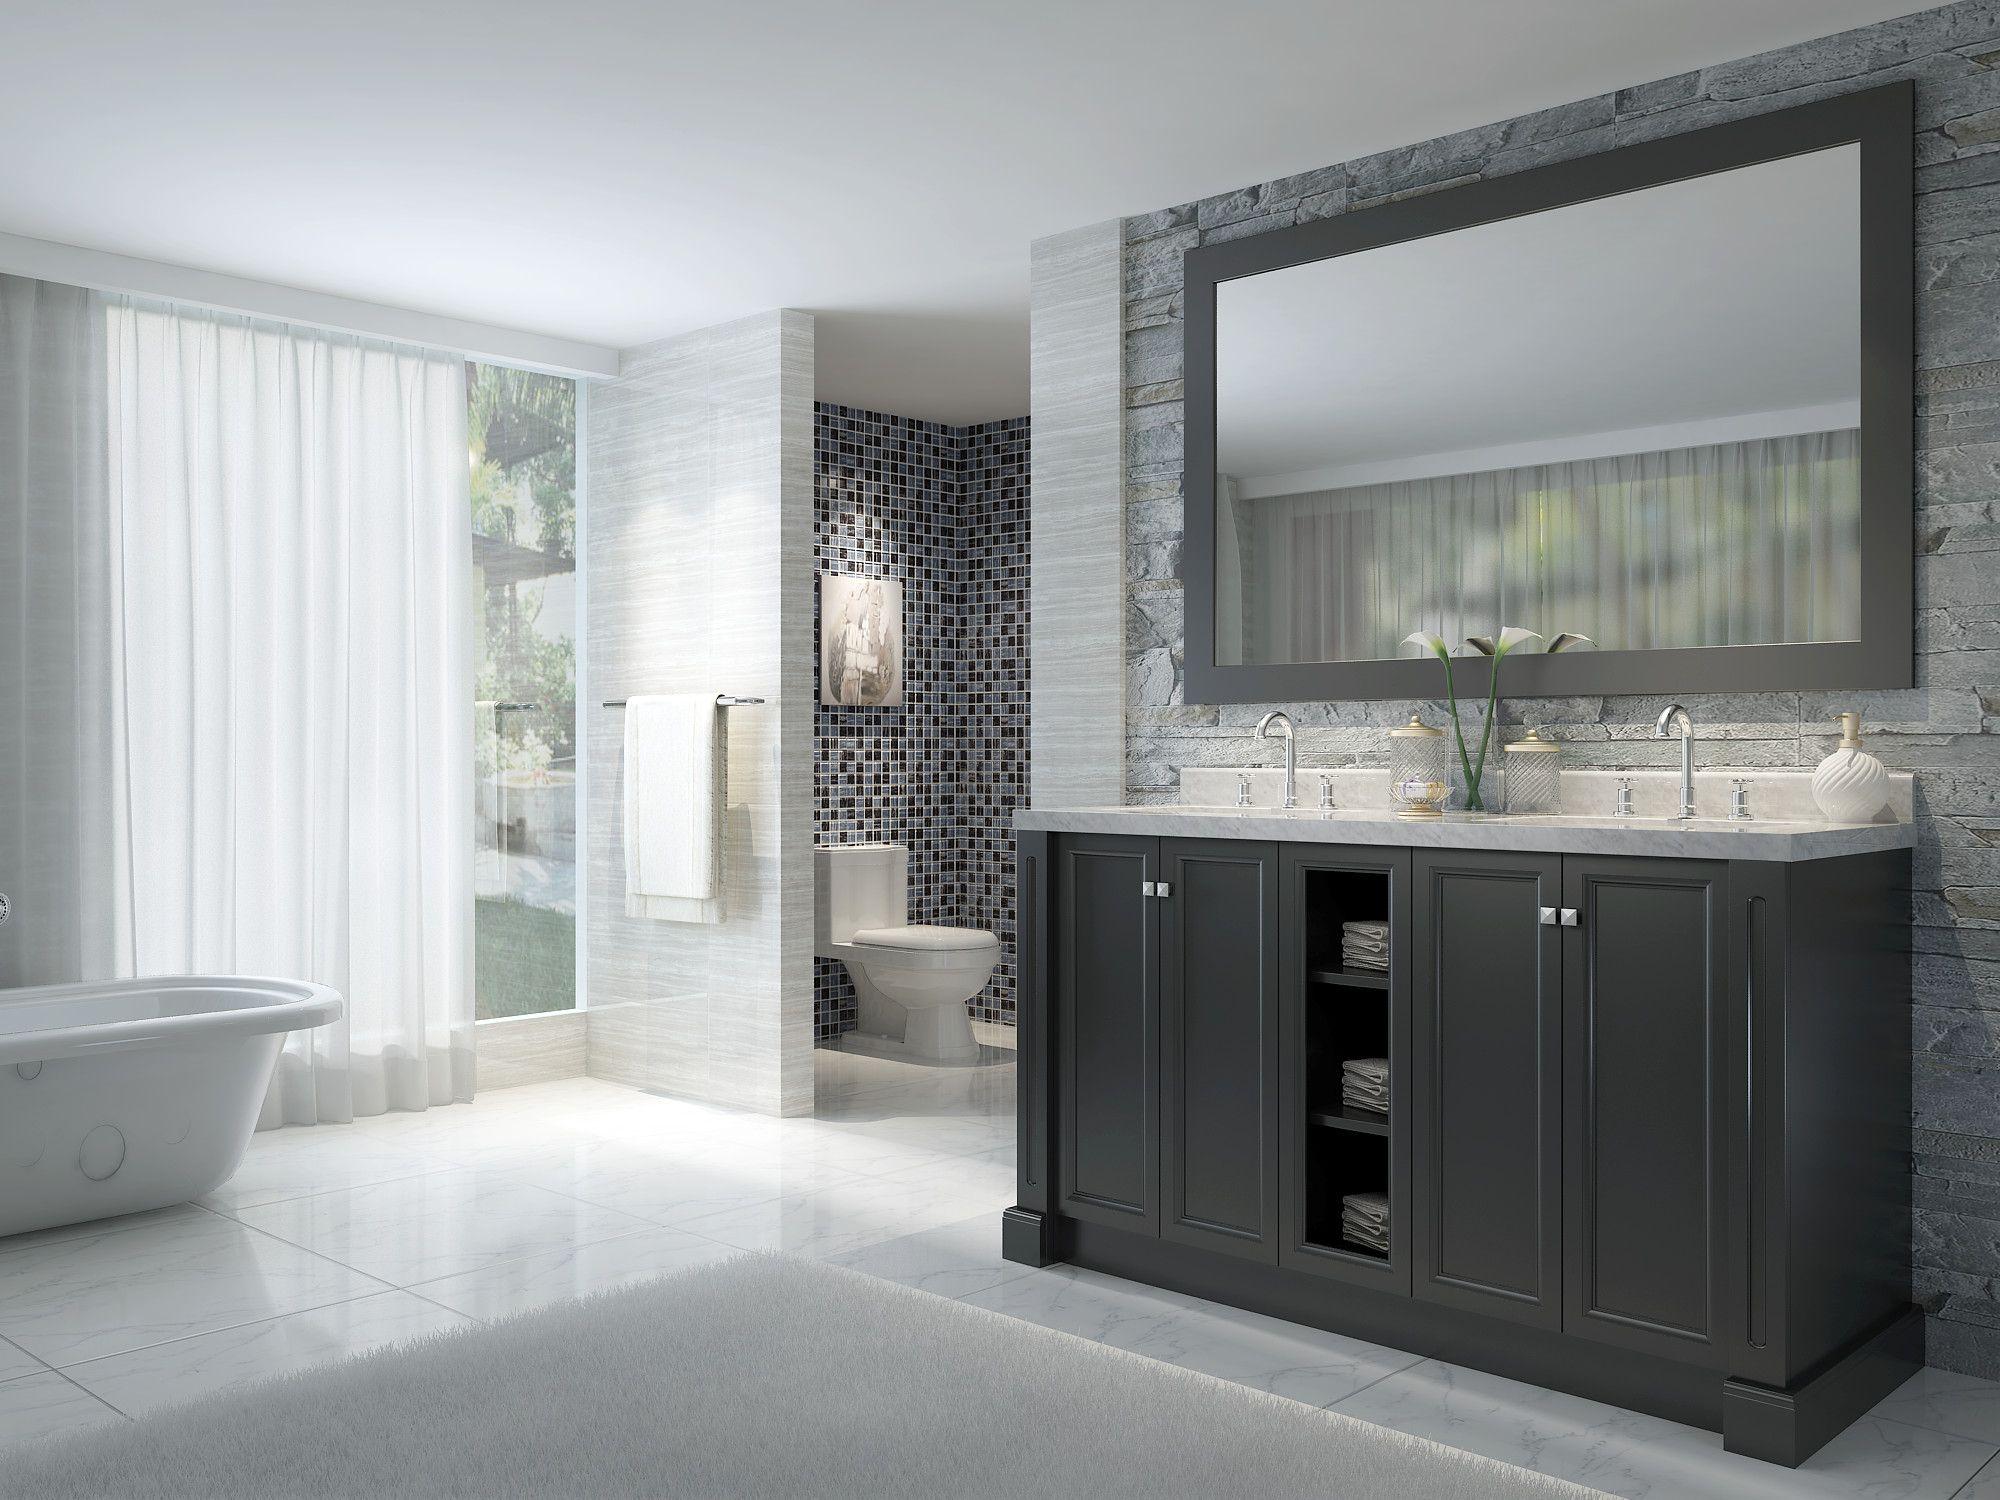 Design Element Hudson 60 Inch Double Sink Bathroom Vanity Set With